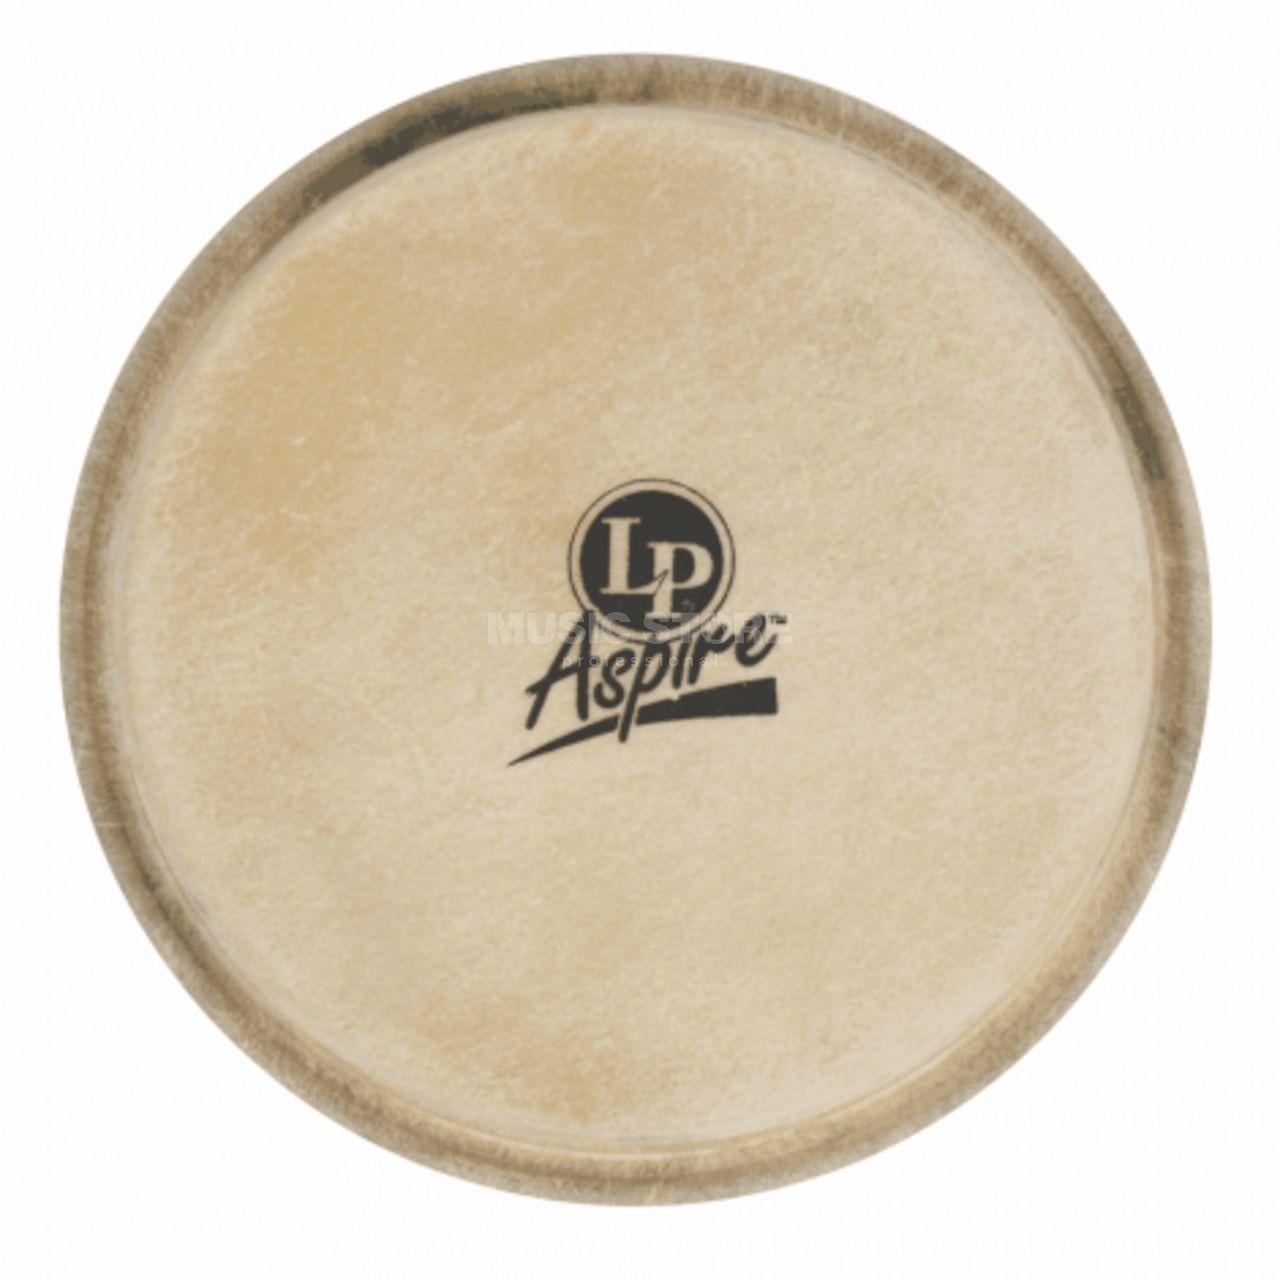 Drum Workshop Bongo Hd. 8 F/lpa601 601f